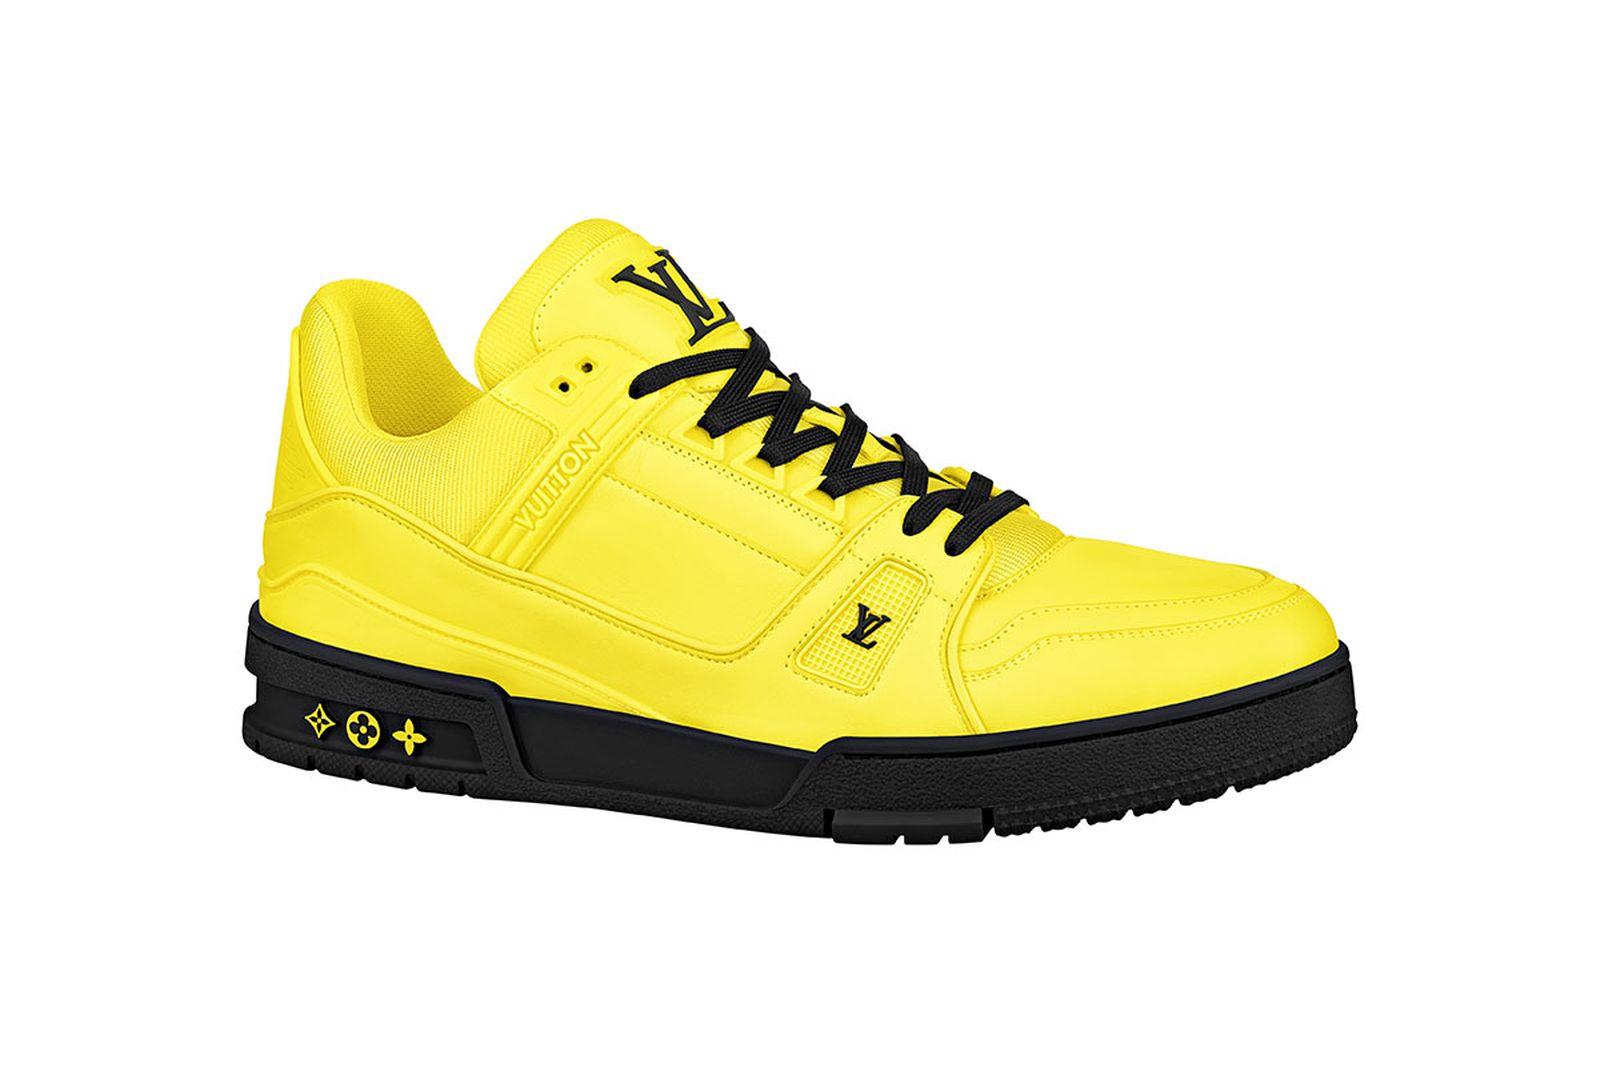 louis-vuitton-rainbow-outerwear-footwear-011